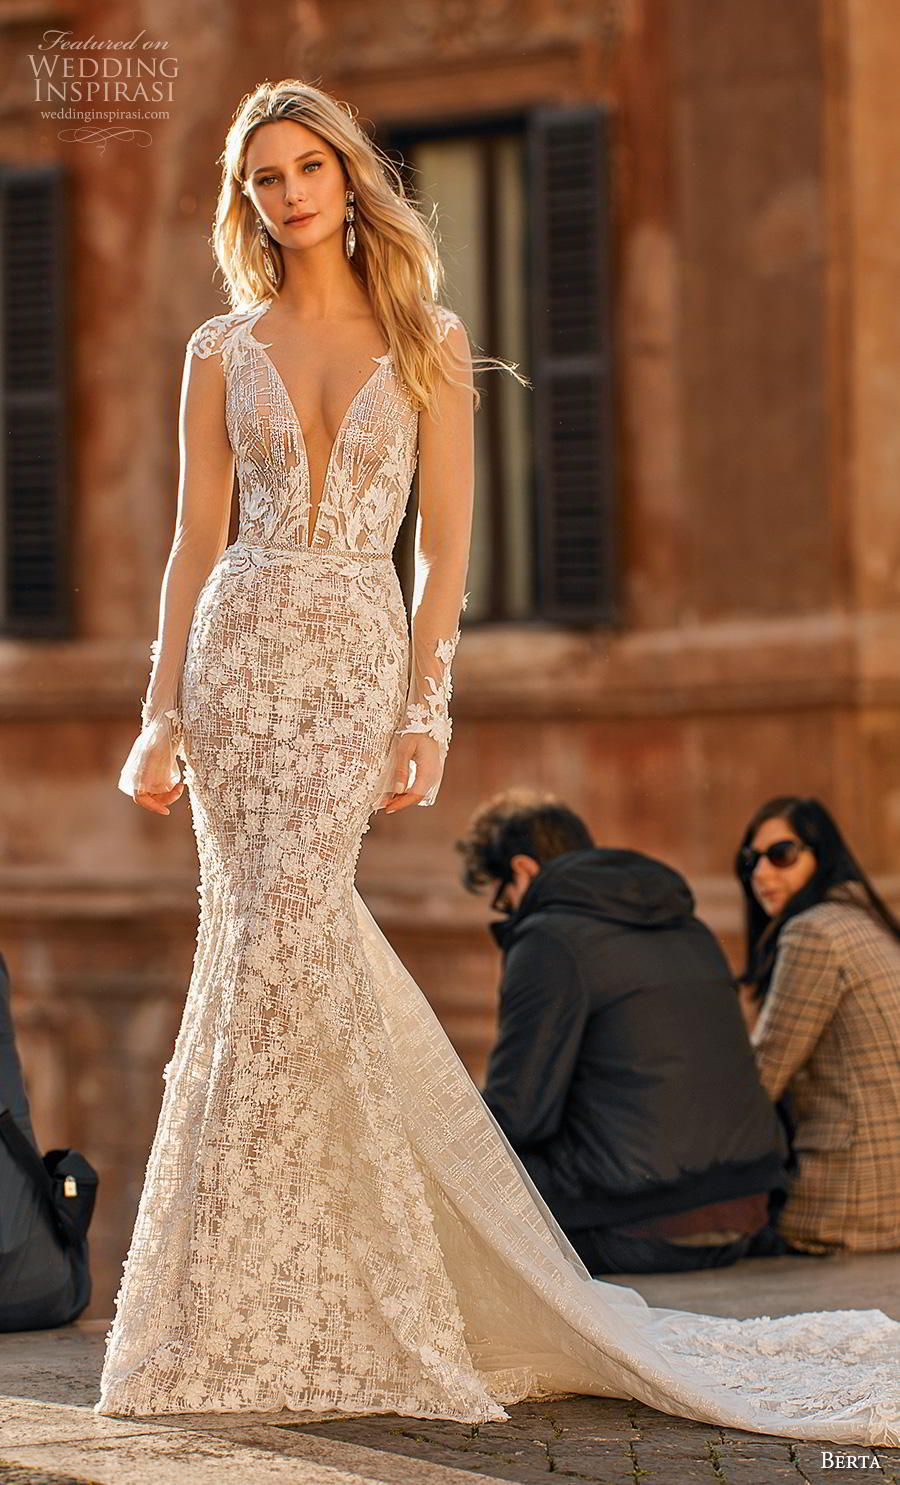 Mermaid Long Wedding Dress Fall Wedding Dress Off The Shoulder Wedding Dress Bridal Gown Wedding Dresses Backless Wedding Wedding Dress Champagne [ 1342 x 1000 Pixel ]